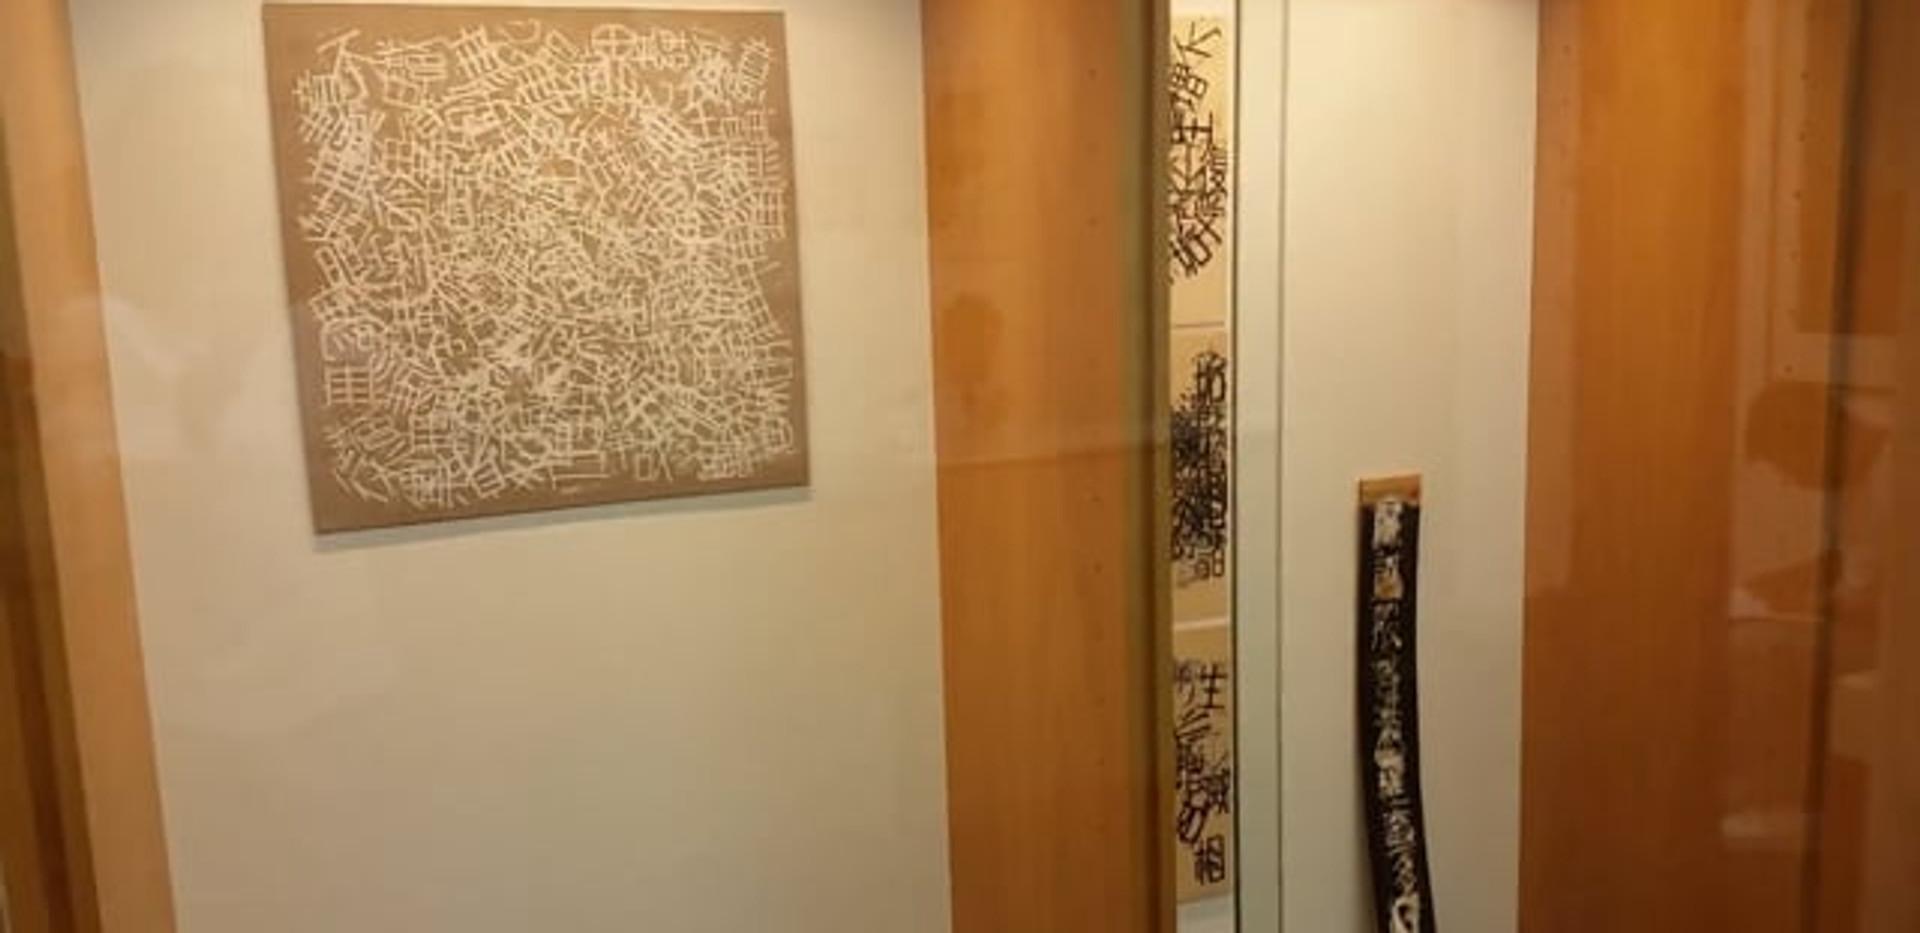 Hanshoshingyo exhibition (2019) in situ